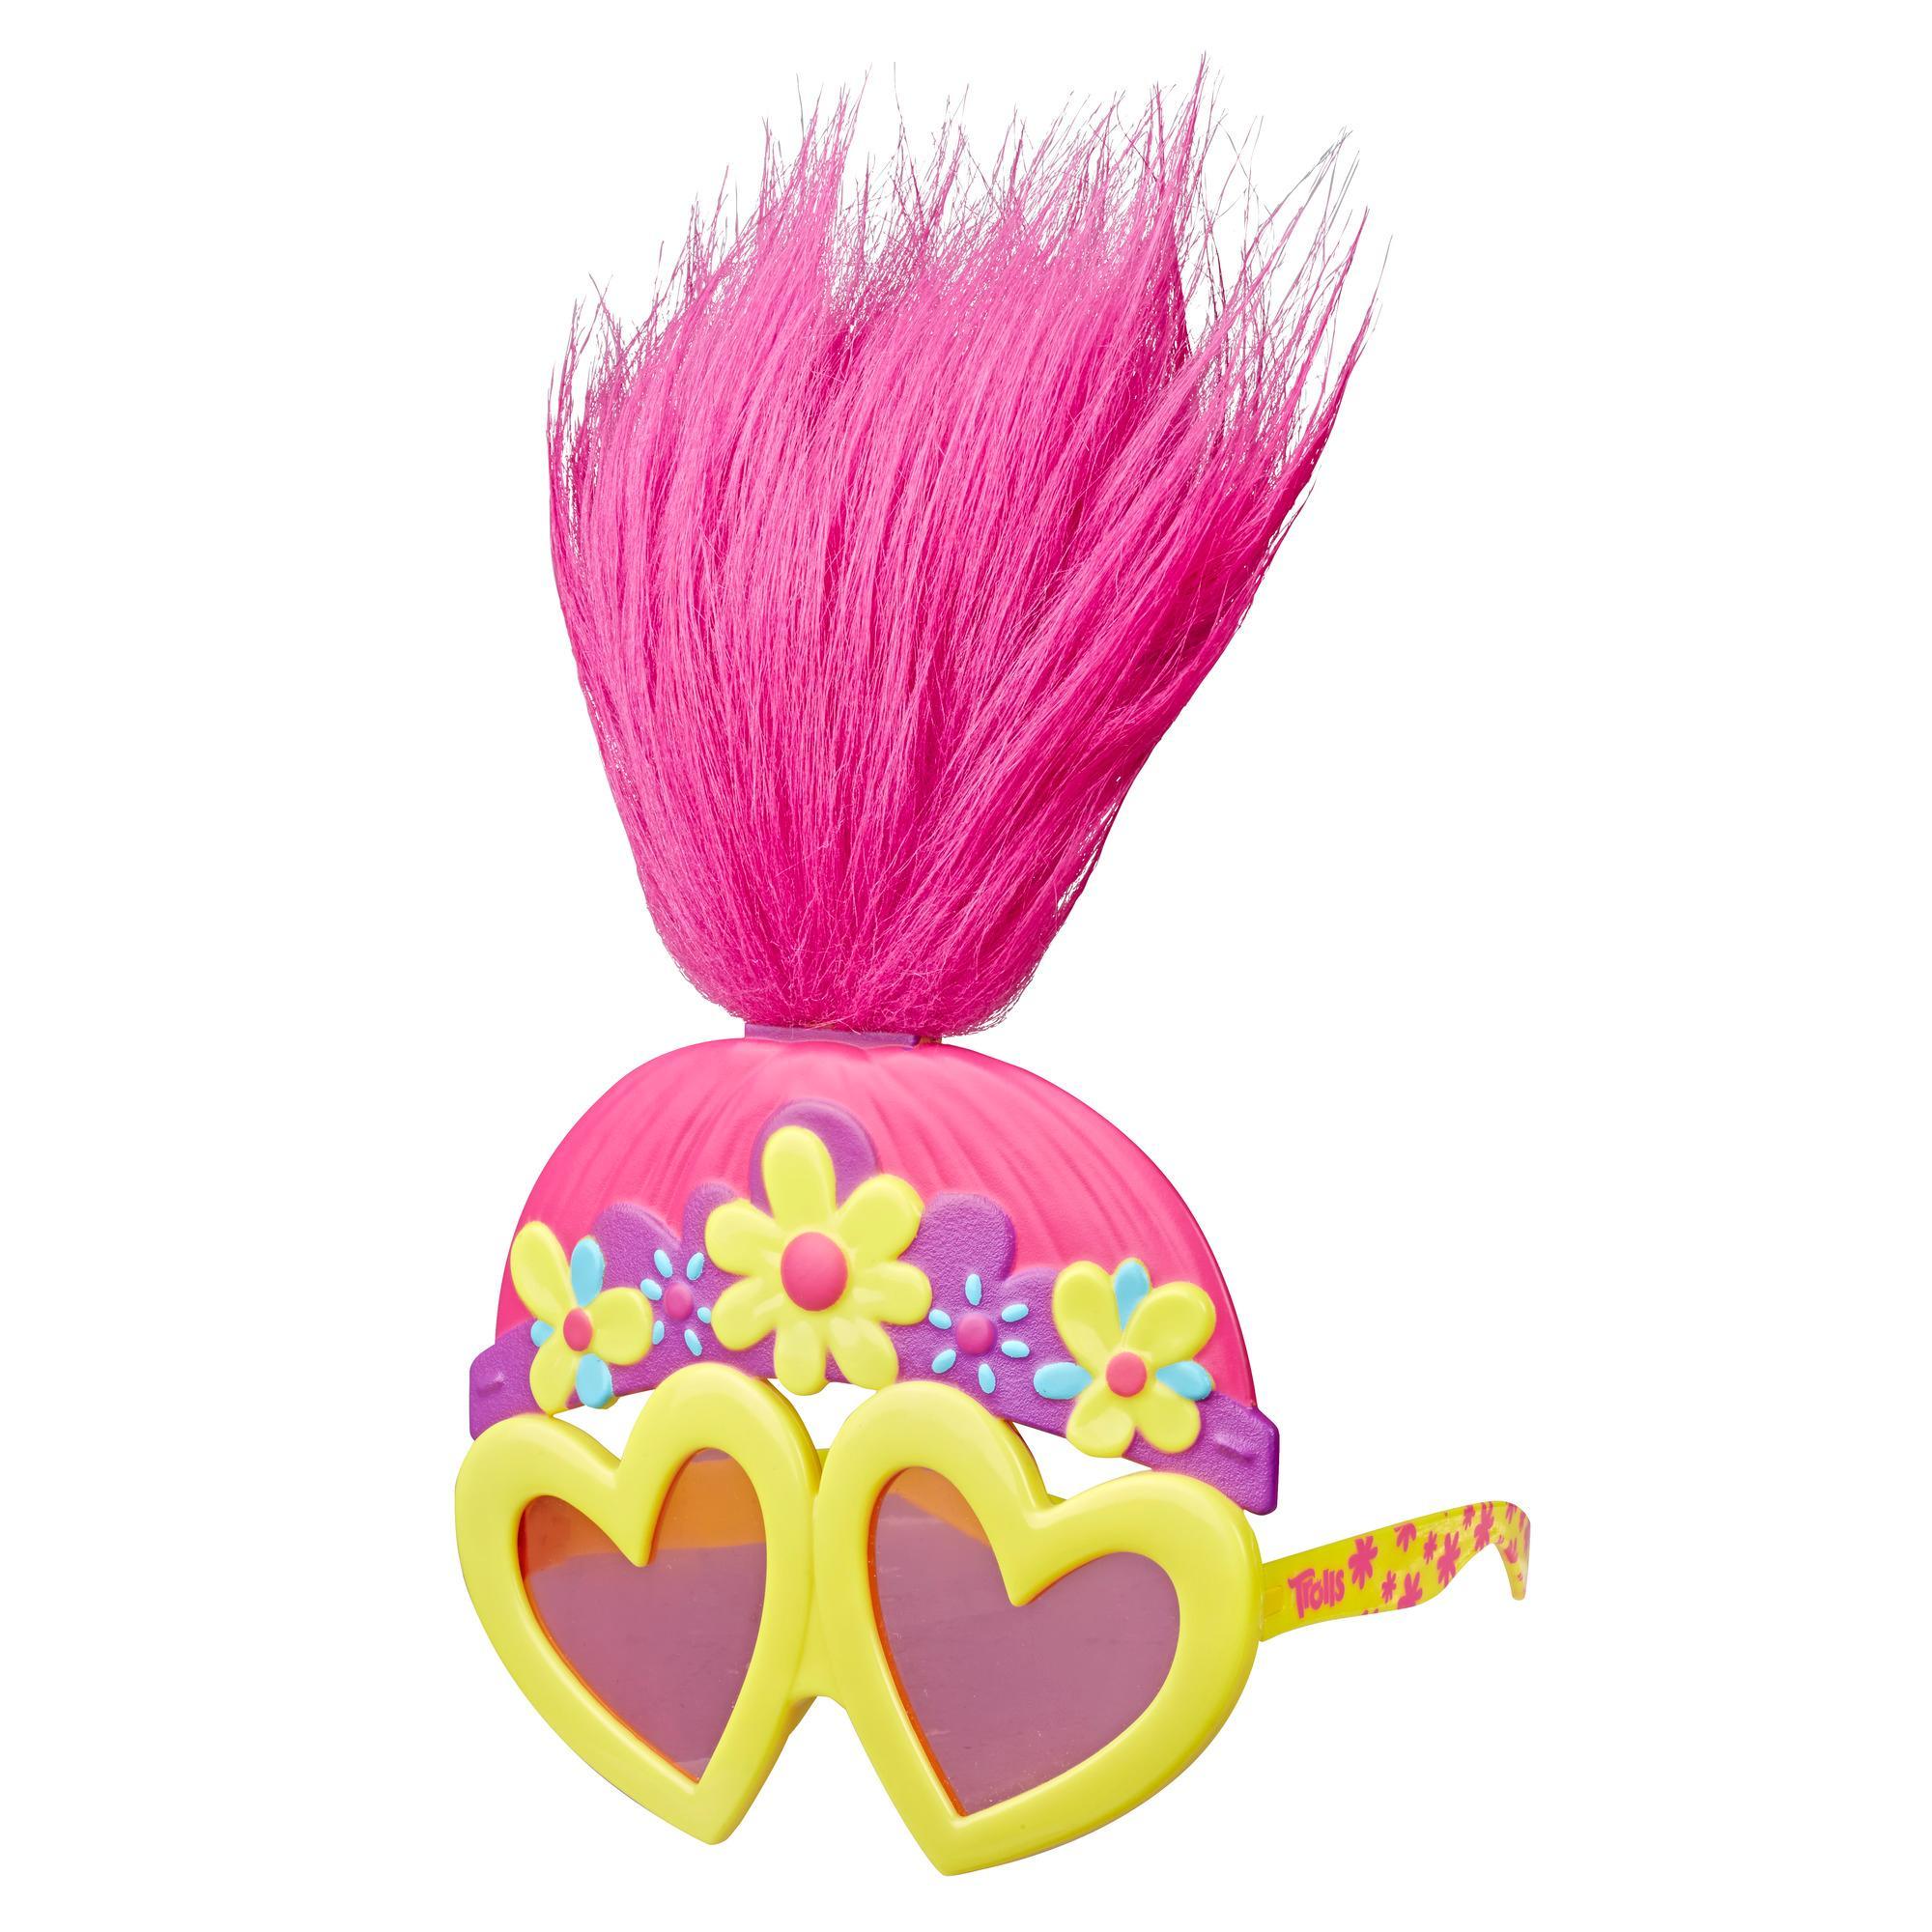 DreamWorks Trolls - Look per la discoteca di Poppy - Occhiali da sole divertenti ispirati al film Trolls World Tour - Da 4 anni in su